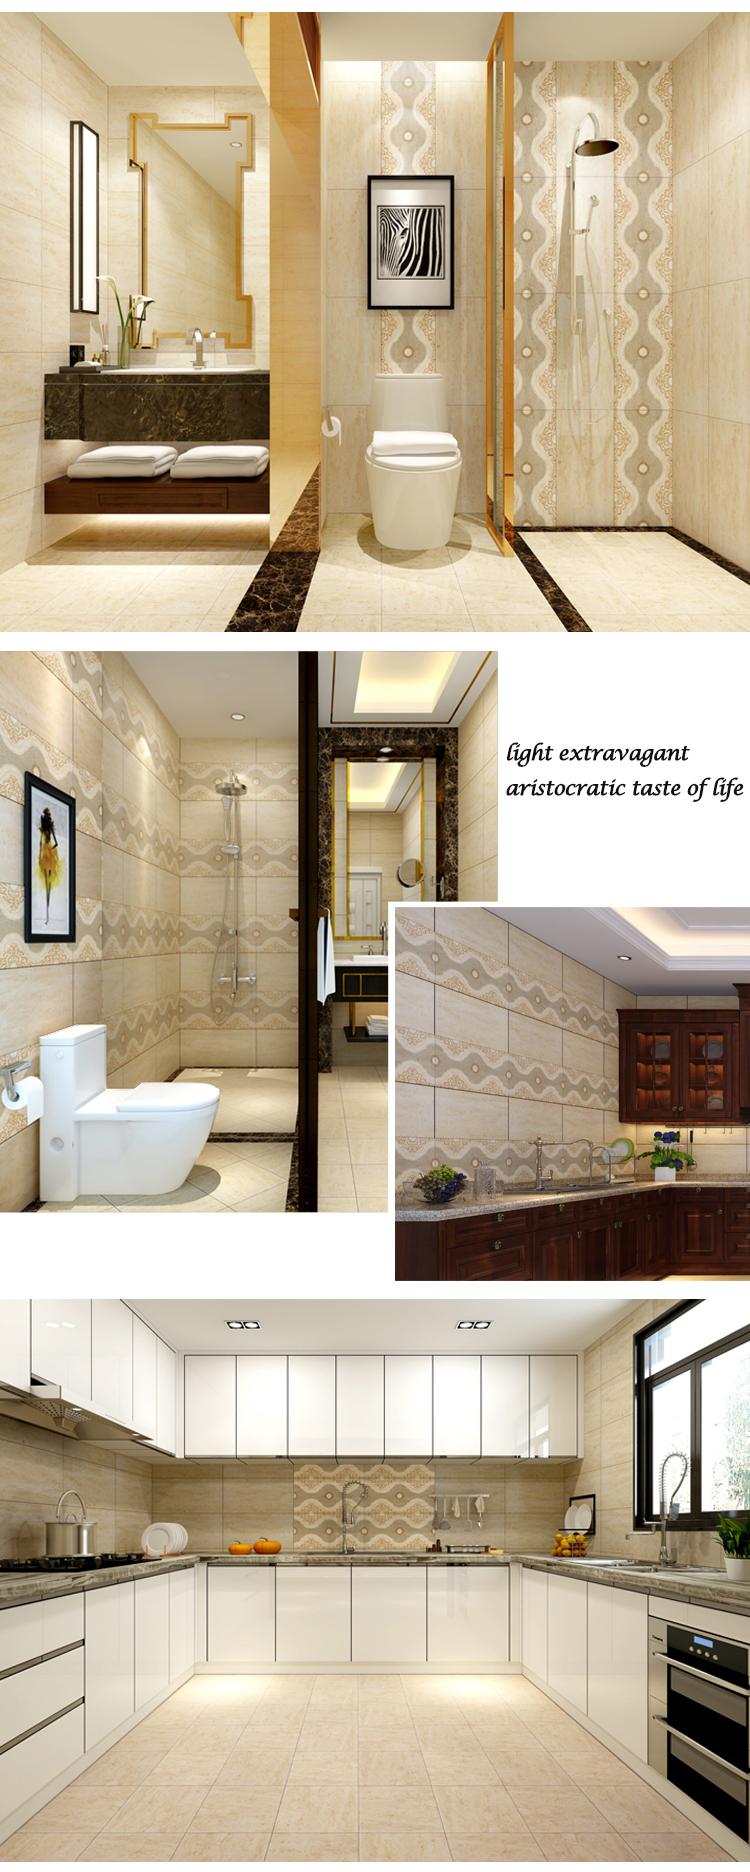 decorative wall tiles. New Design 30x60cm Glossy Decorative Wall Tile For Bathroom Tiles